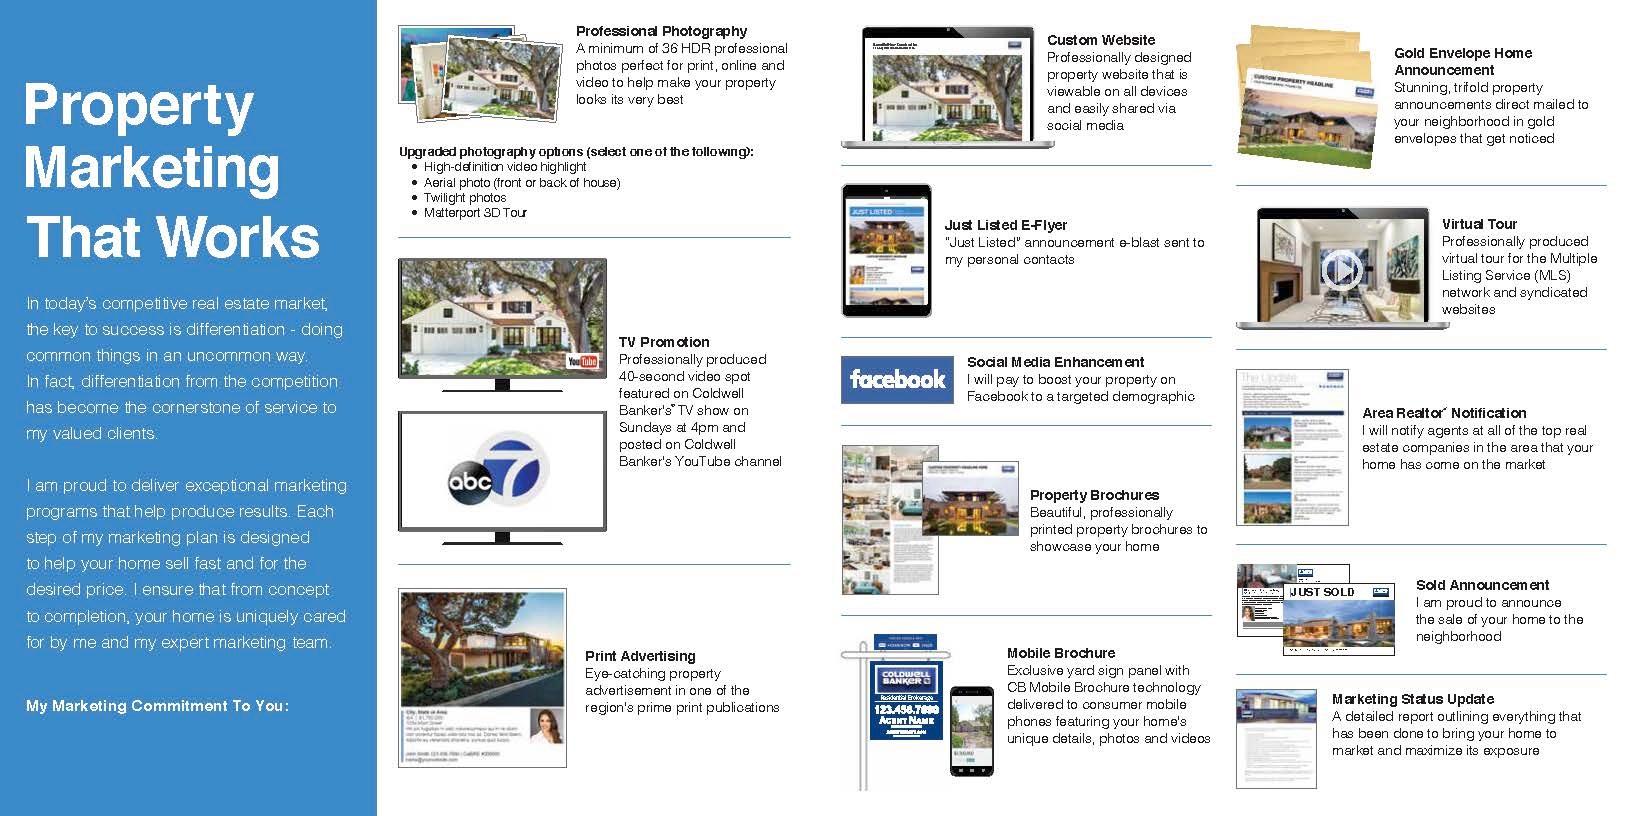 listing-concierge-consumer-brochure-platinum-package-275761_Page_2